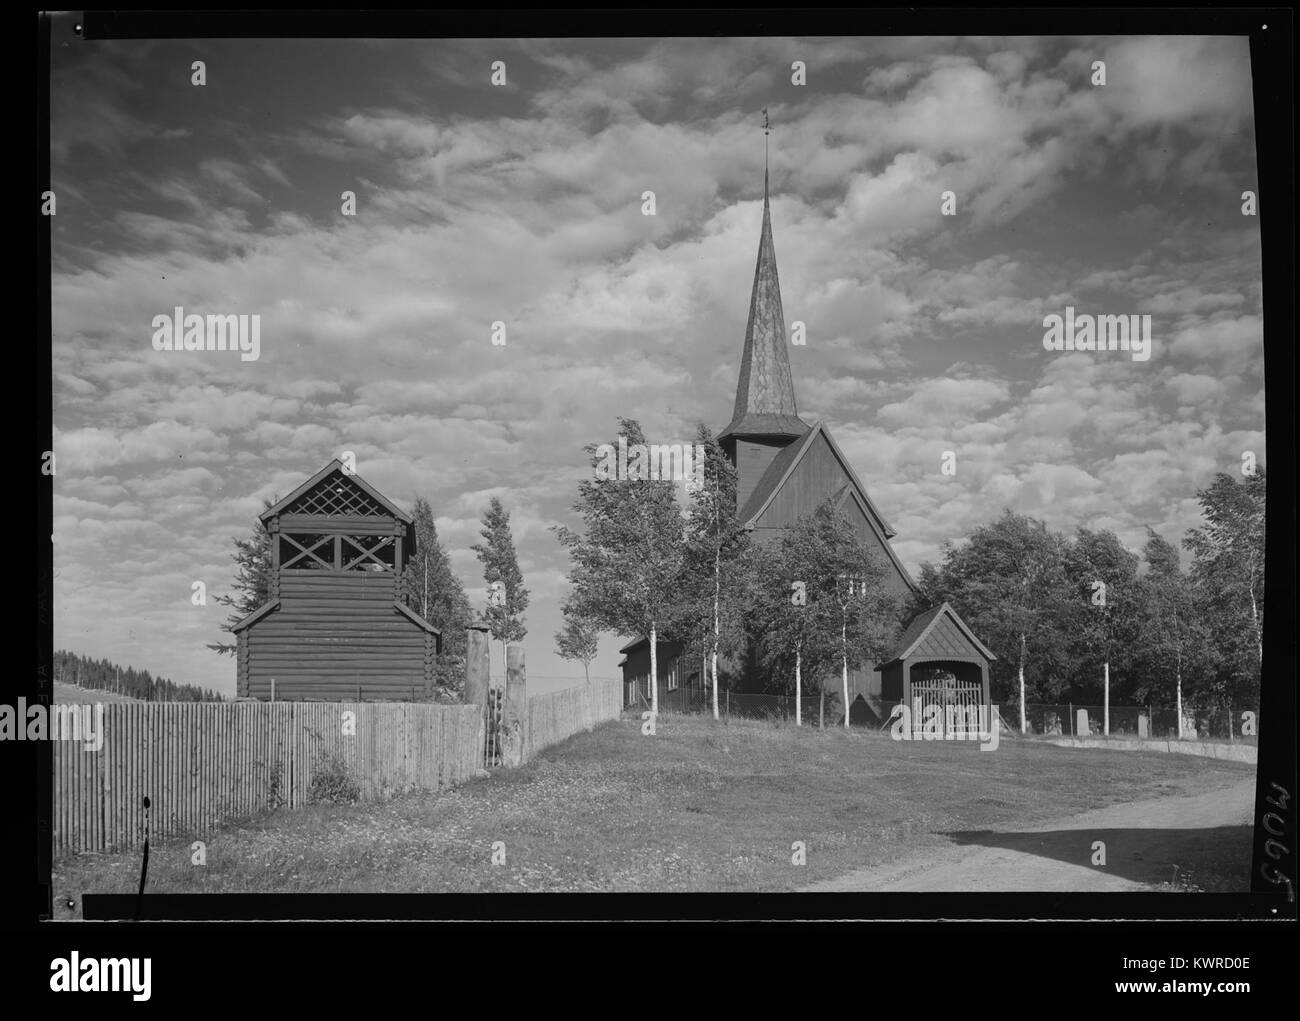 Øystre Slidre - no-nb digifoto 20160303 00032 NB MIT FNR 07065 - Stock Image